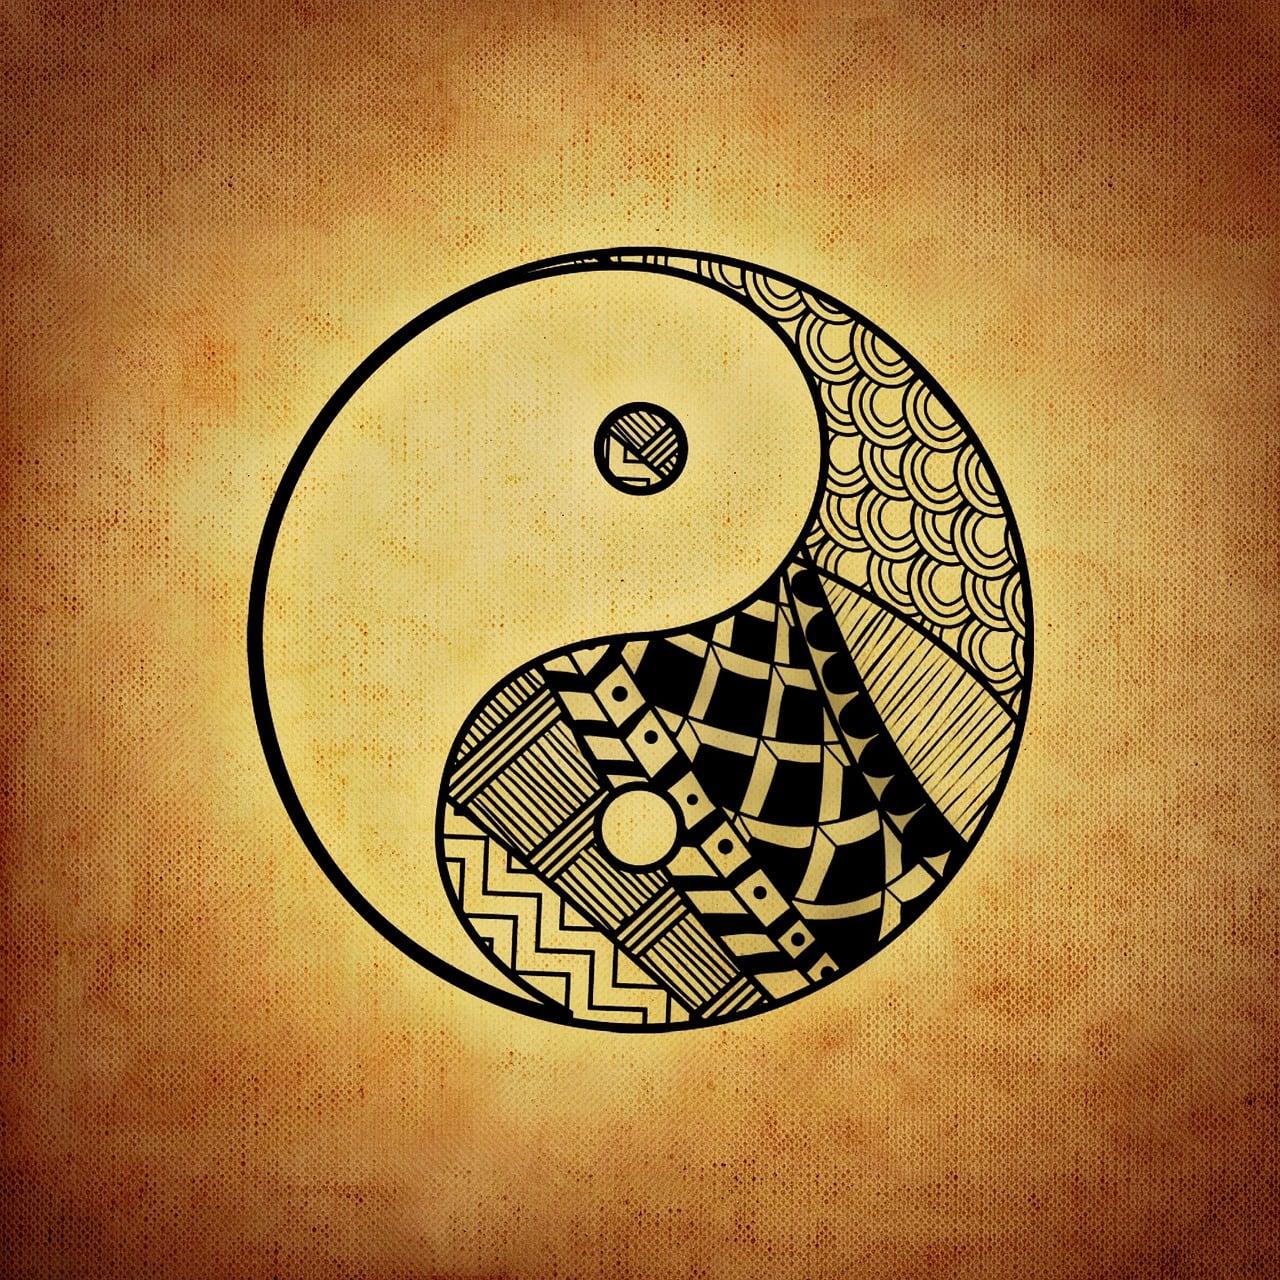 Yin Yang – Harmonija energij in teorija polarnosti 6